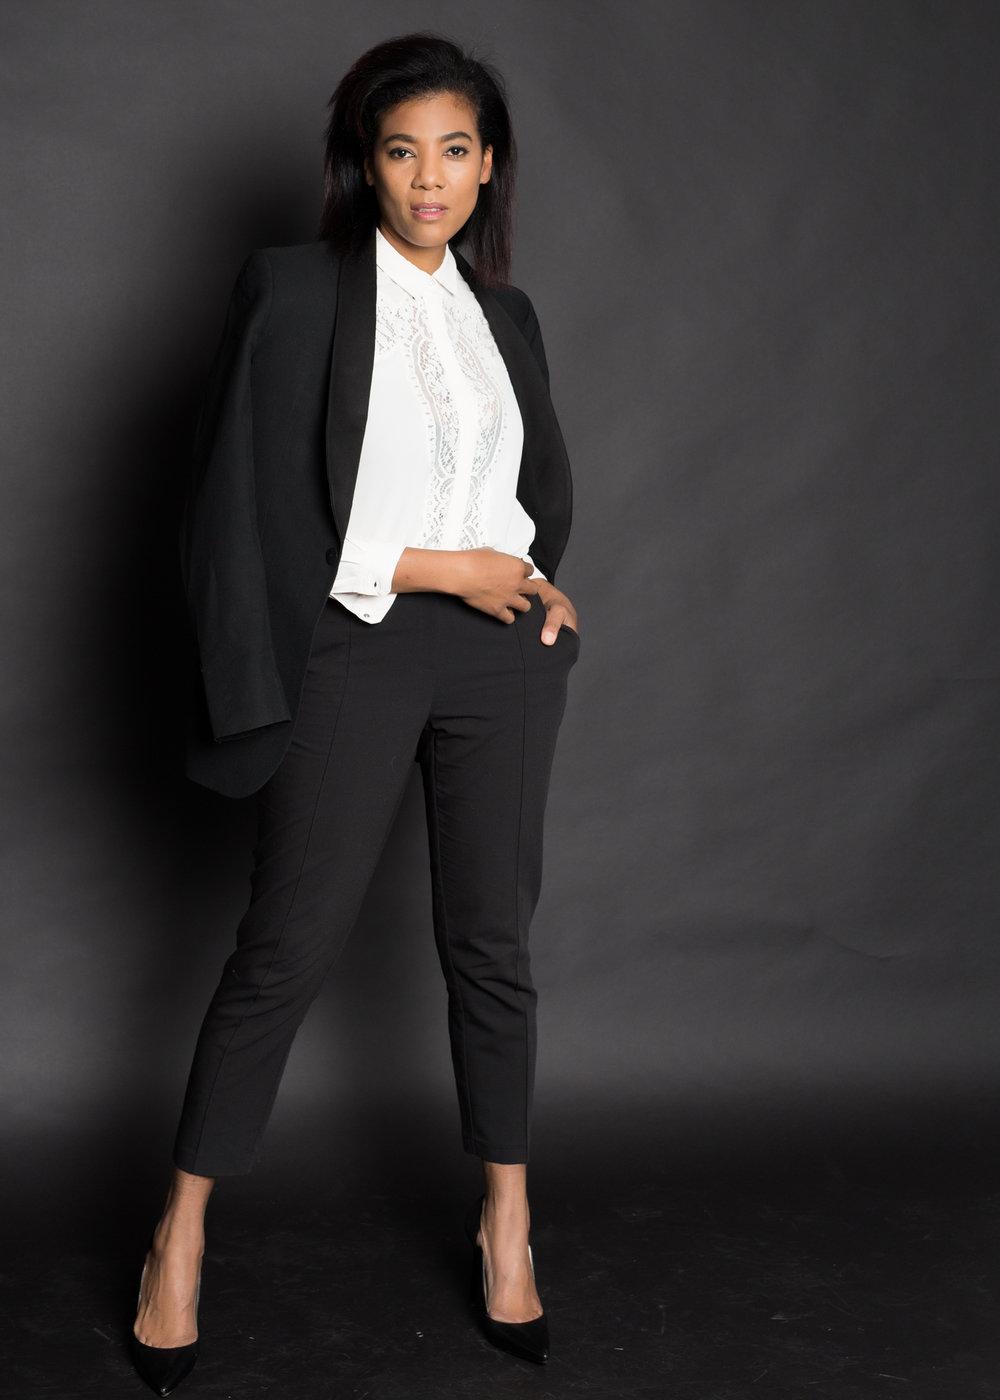 Elegant business portrait